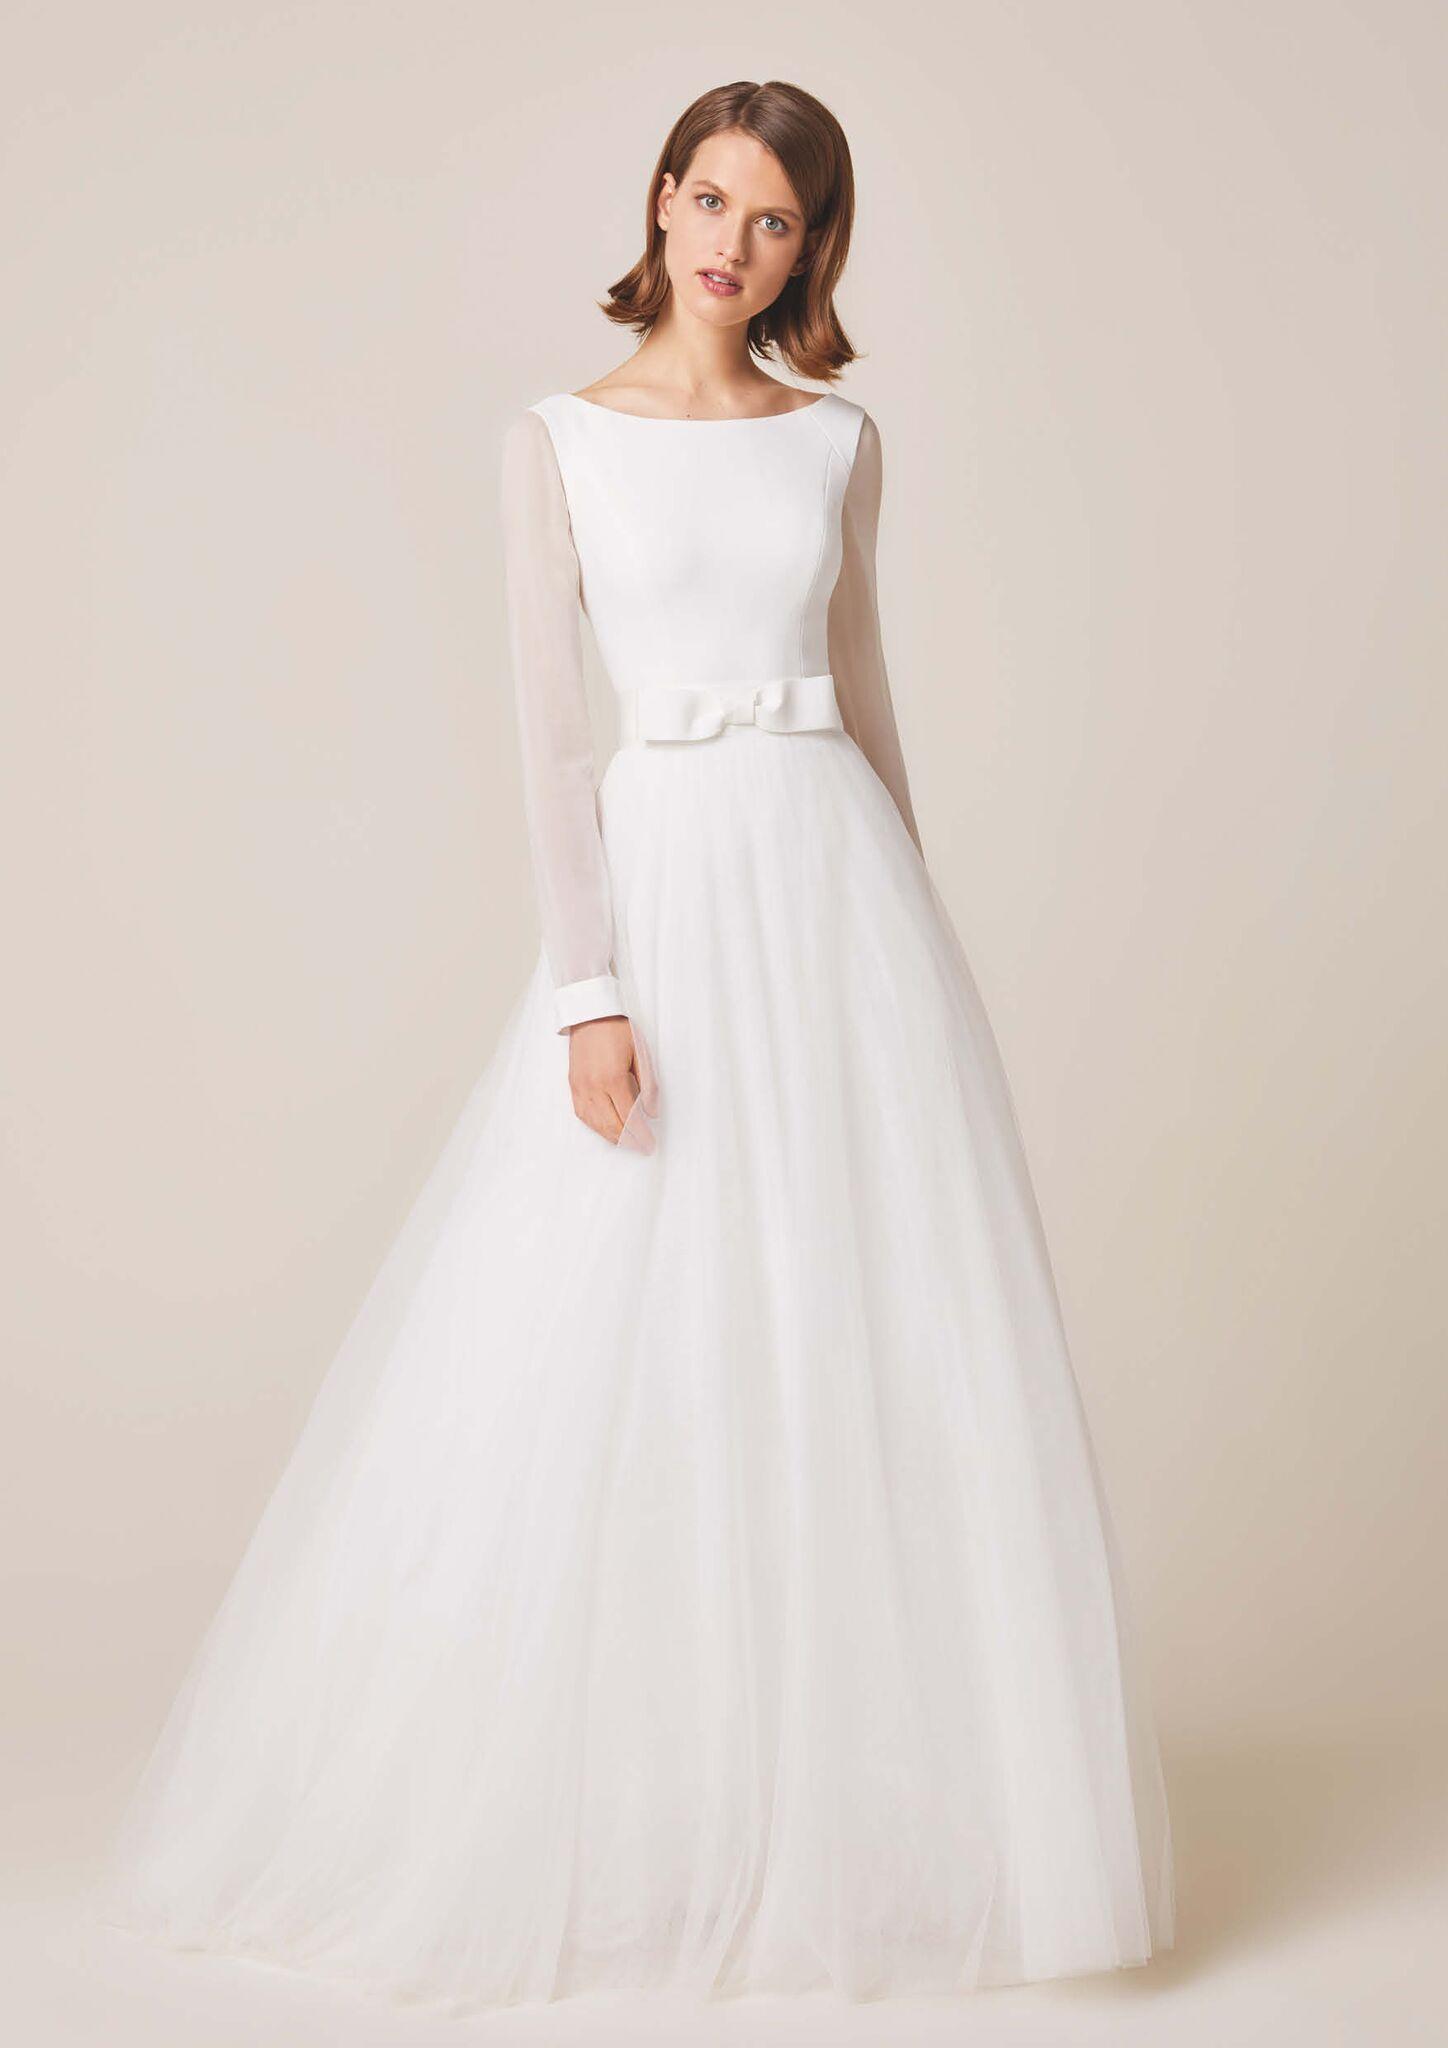 Jesus Peiro Lara Spring Wedding Dress Occasion Dresses Fashion Wedding Dress Long Sleeve